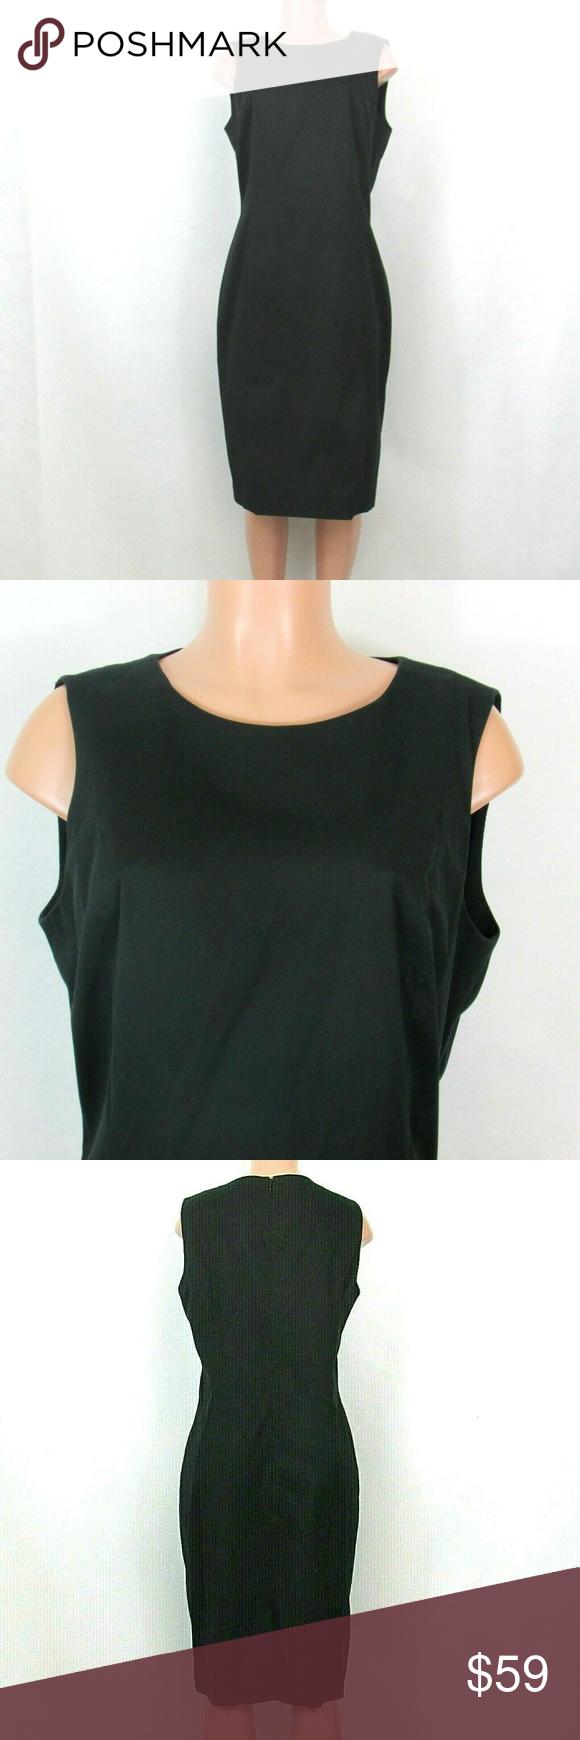 Nwt Austin Reed Black Sleeveless Shift Dress 14 In 2020 Sleeveless Shift Dress Shift Dress Sleeveless